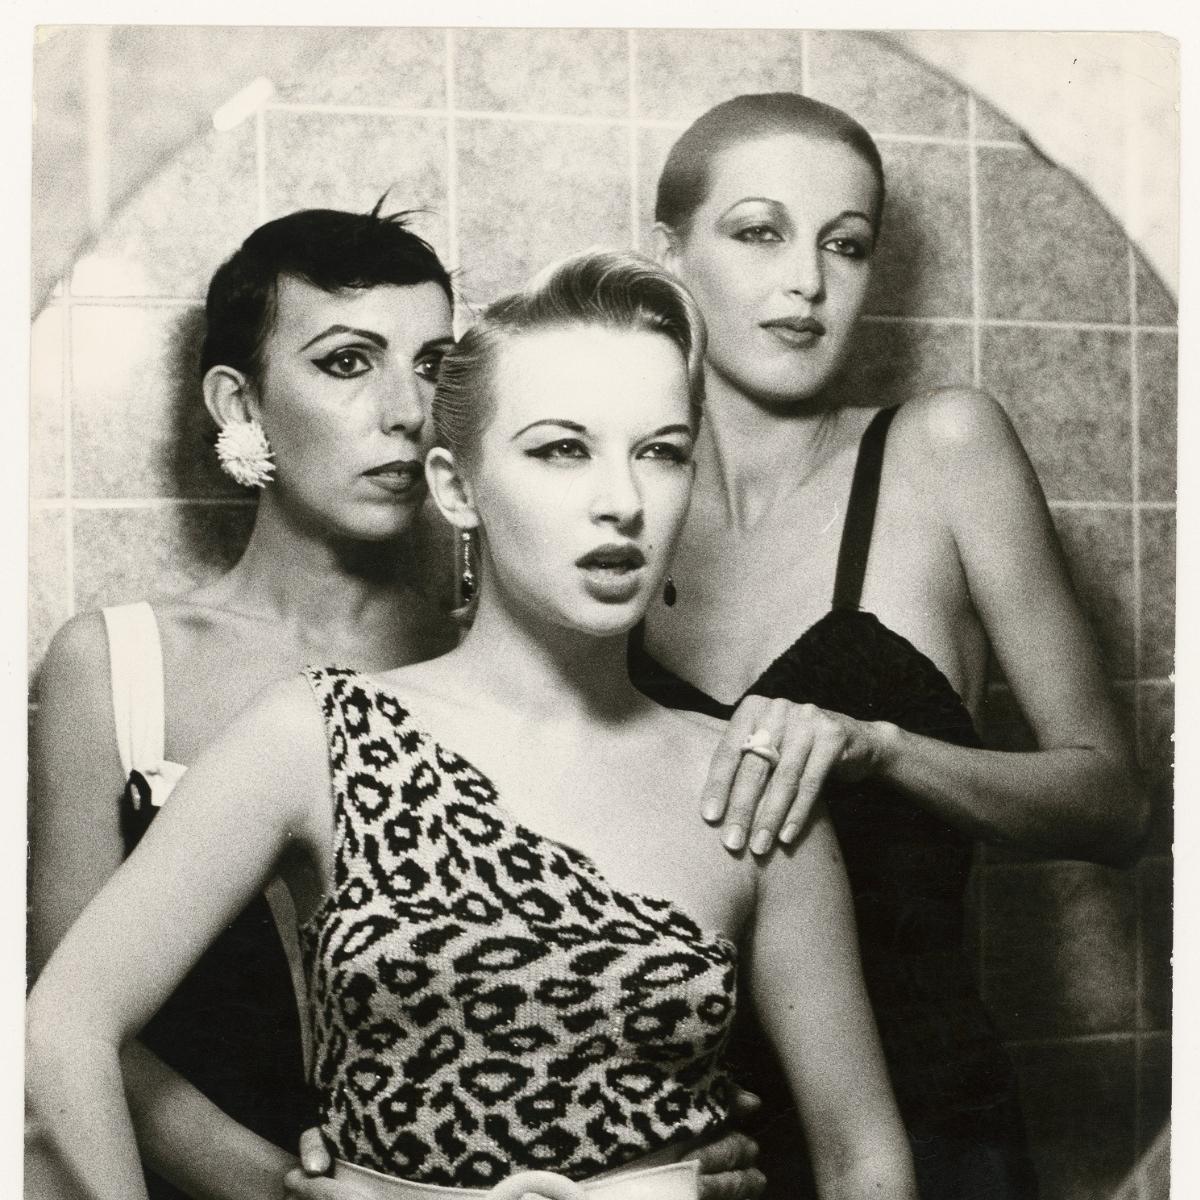 Ulrike Ottinger, Ohne Titel (Claudia Skoda, Tabea Blumenschein & Jenny Capitain), Silbergelatine-Vintageprint, ca. 197778,  Ulrike Ottinger